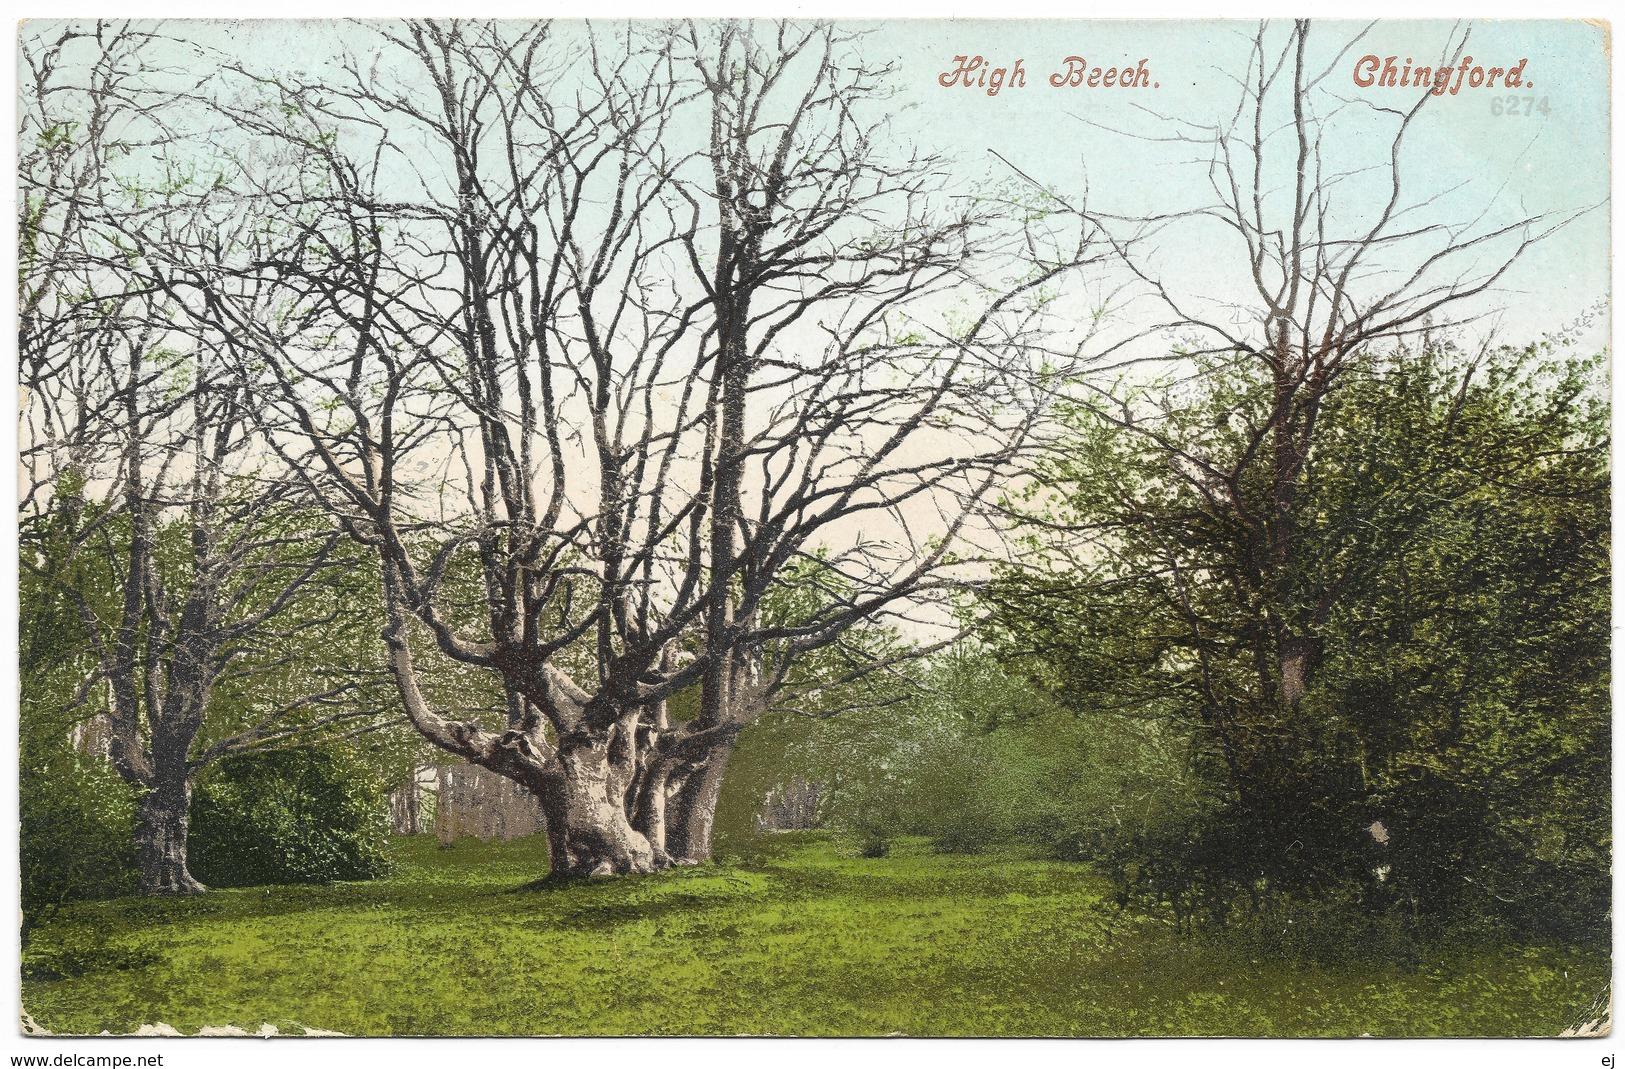 High Beech Chingford Waltham Forest London - Postmark 1904 - London Suburbs